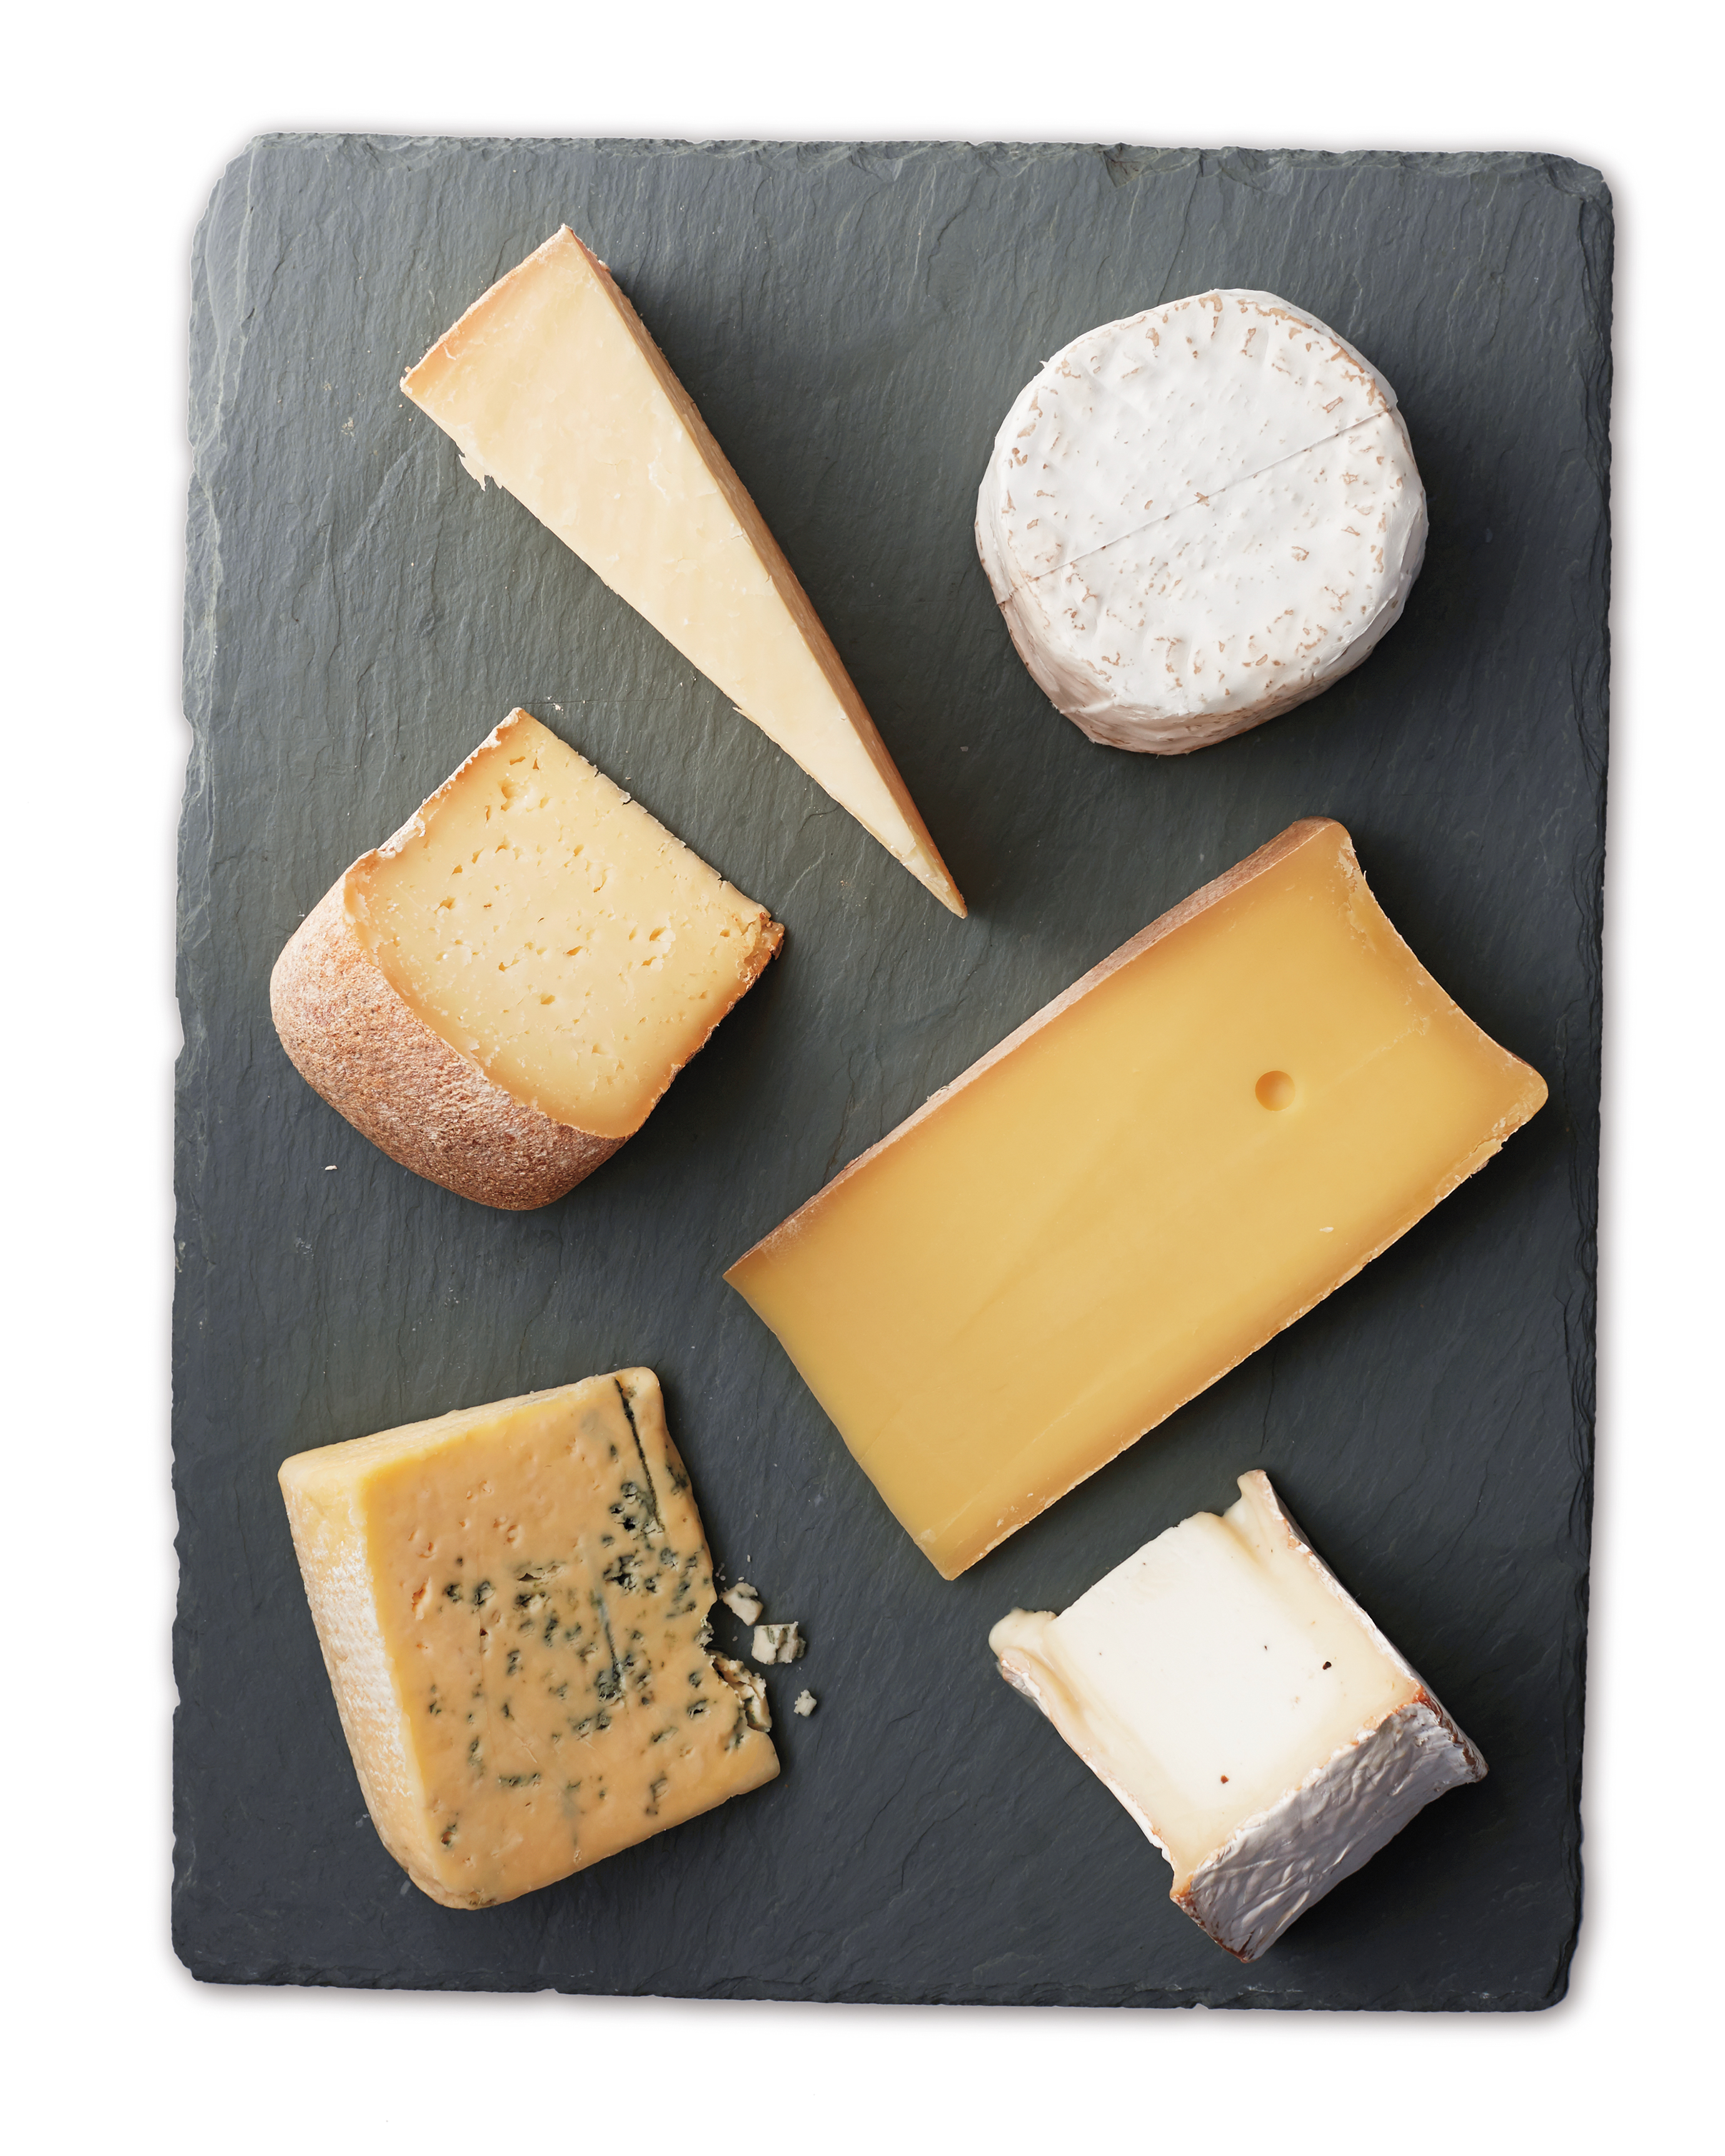 sarah-kelly-big-sur-rw-workbook-cheese-plate-003-d111039.jpg